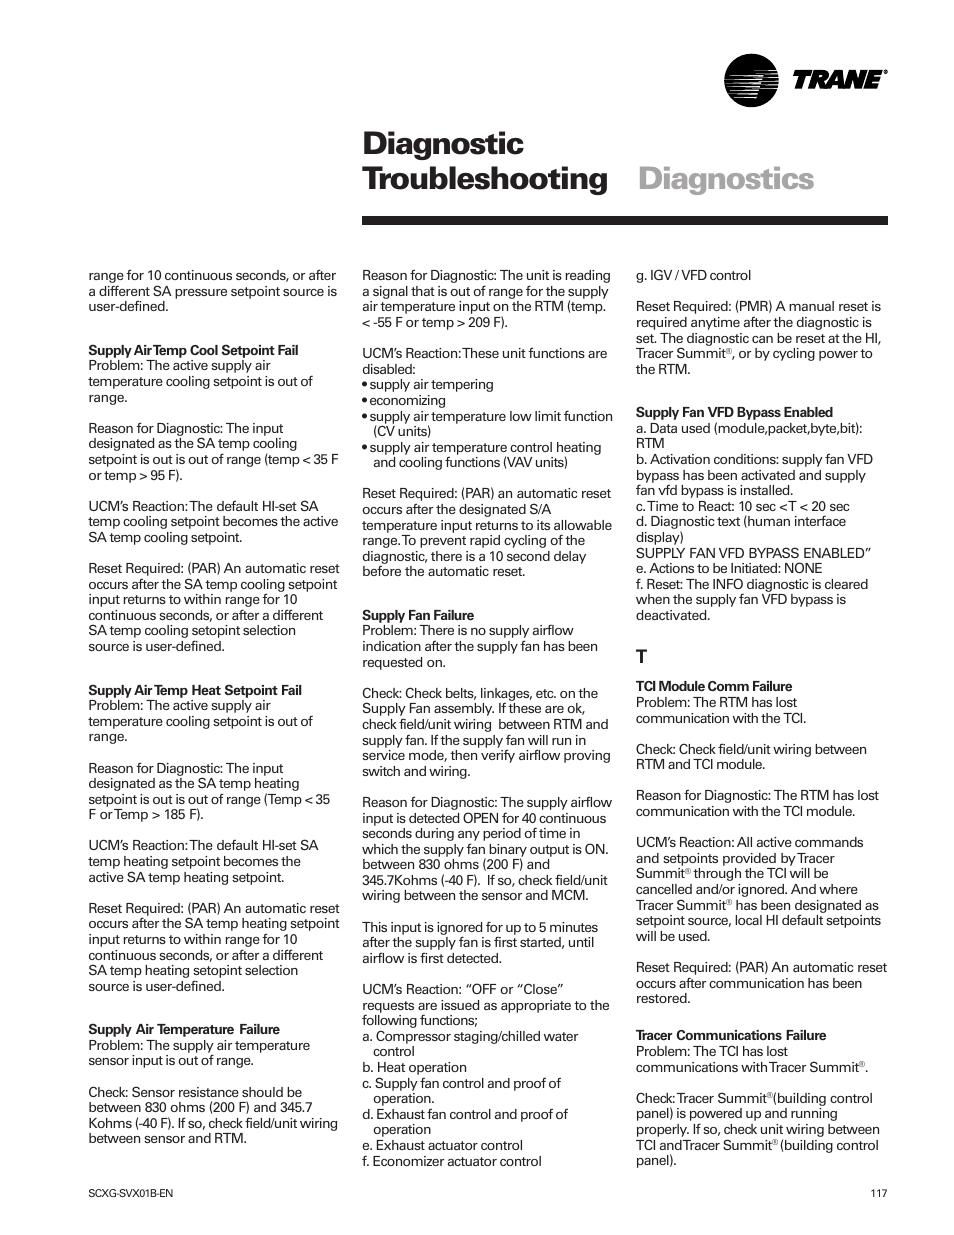 diagnostic troubleshooting diagnostics trane intellipak scwg 020 rh manualsdir com Psychiatric Diagnostic Manual Diagnostic Manual Intellectual Disability